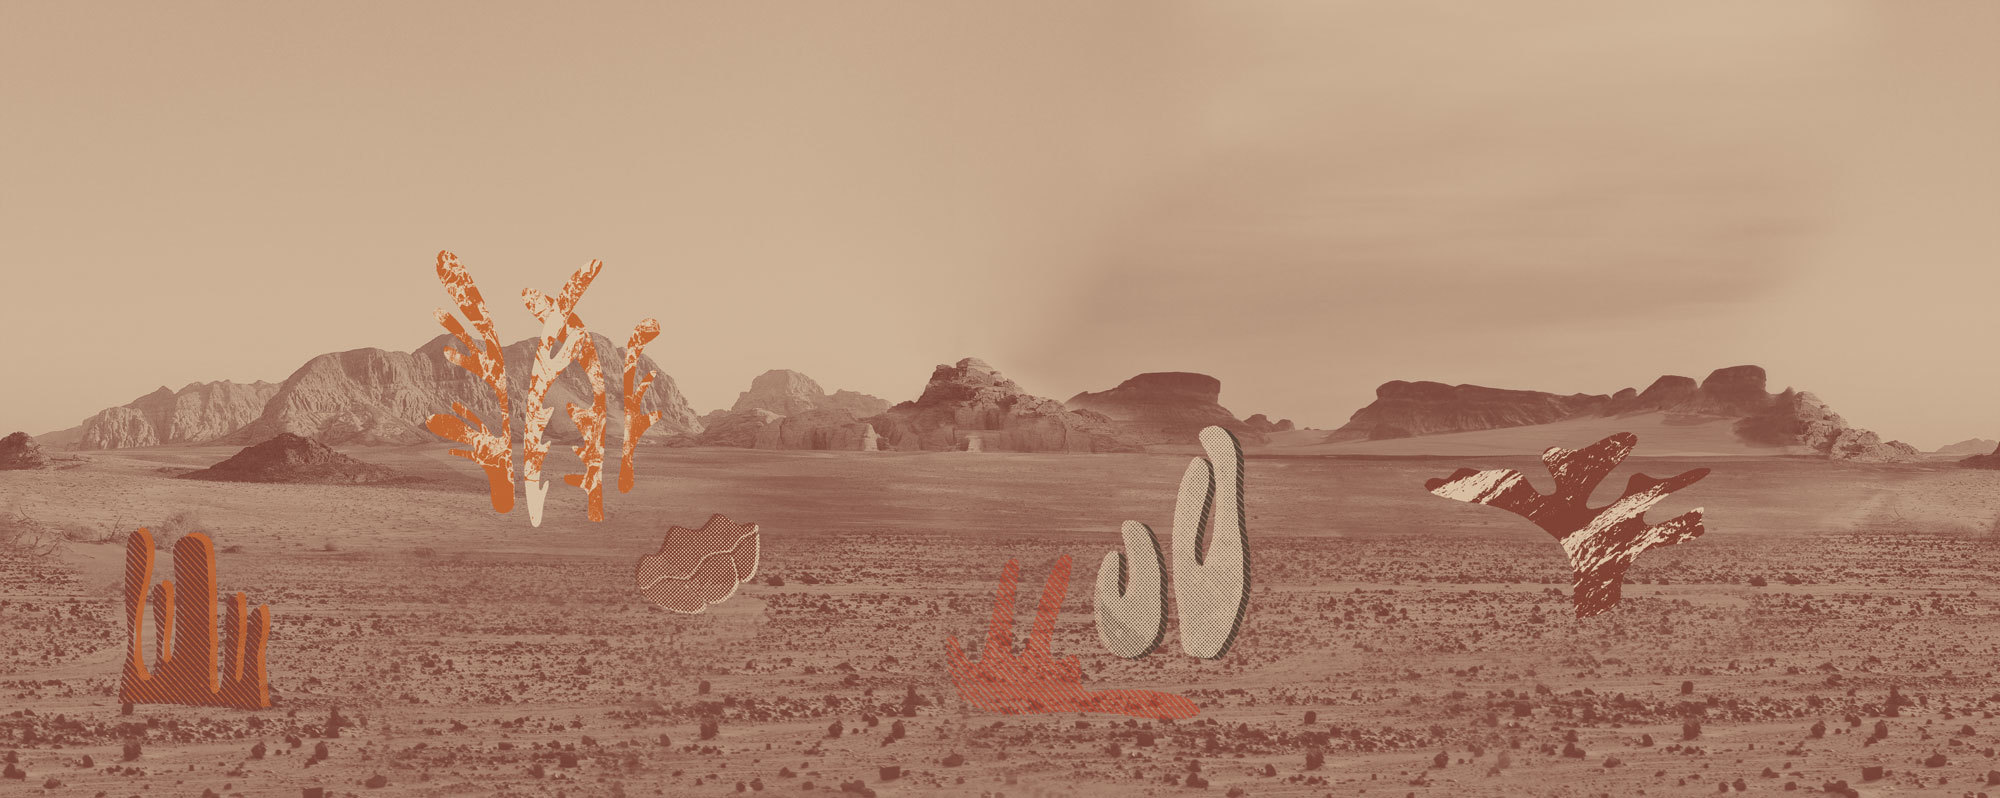 Desert Botanica für Wall&decò